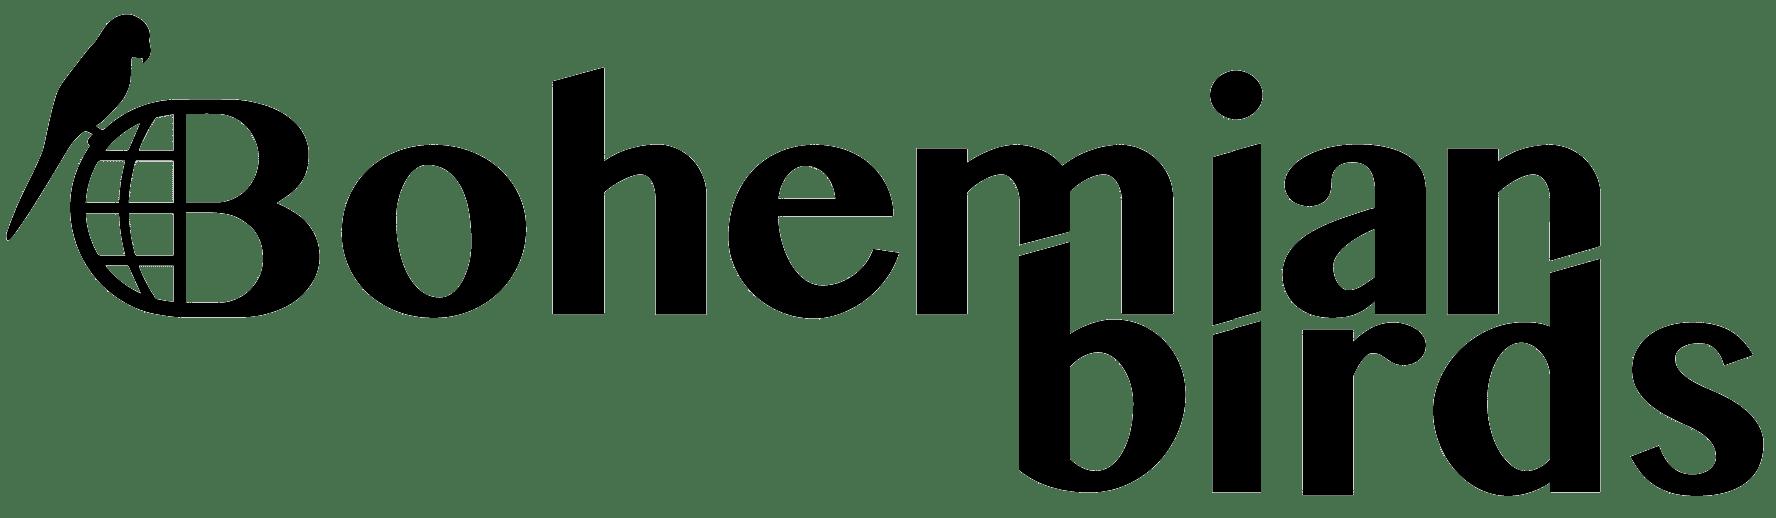 bohemian birds logo